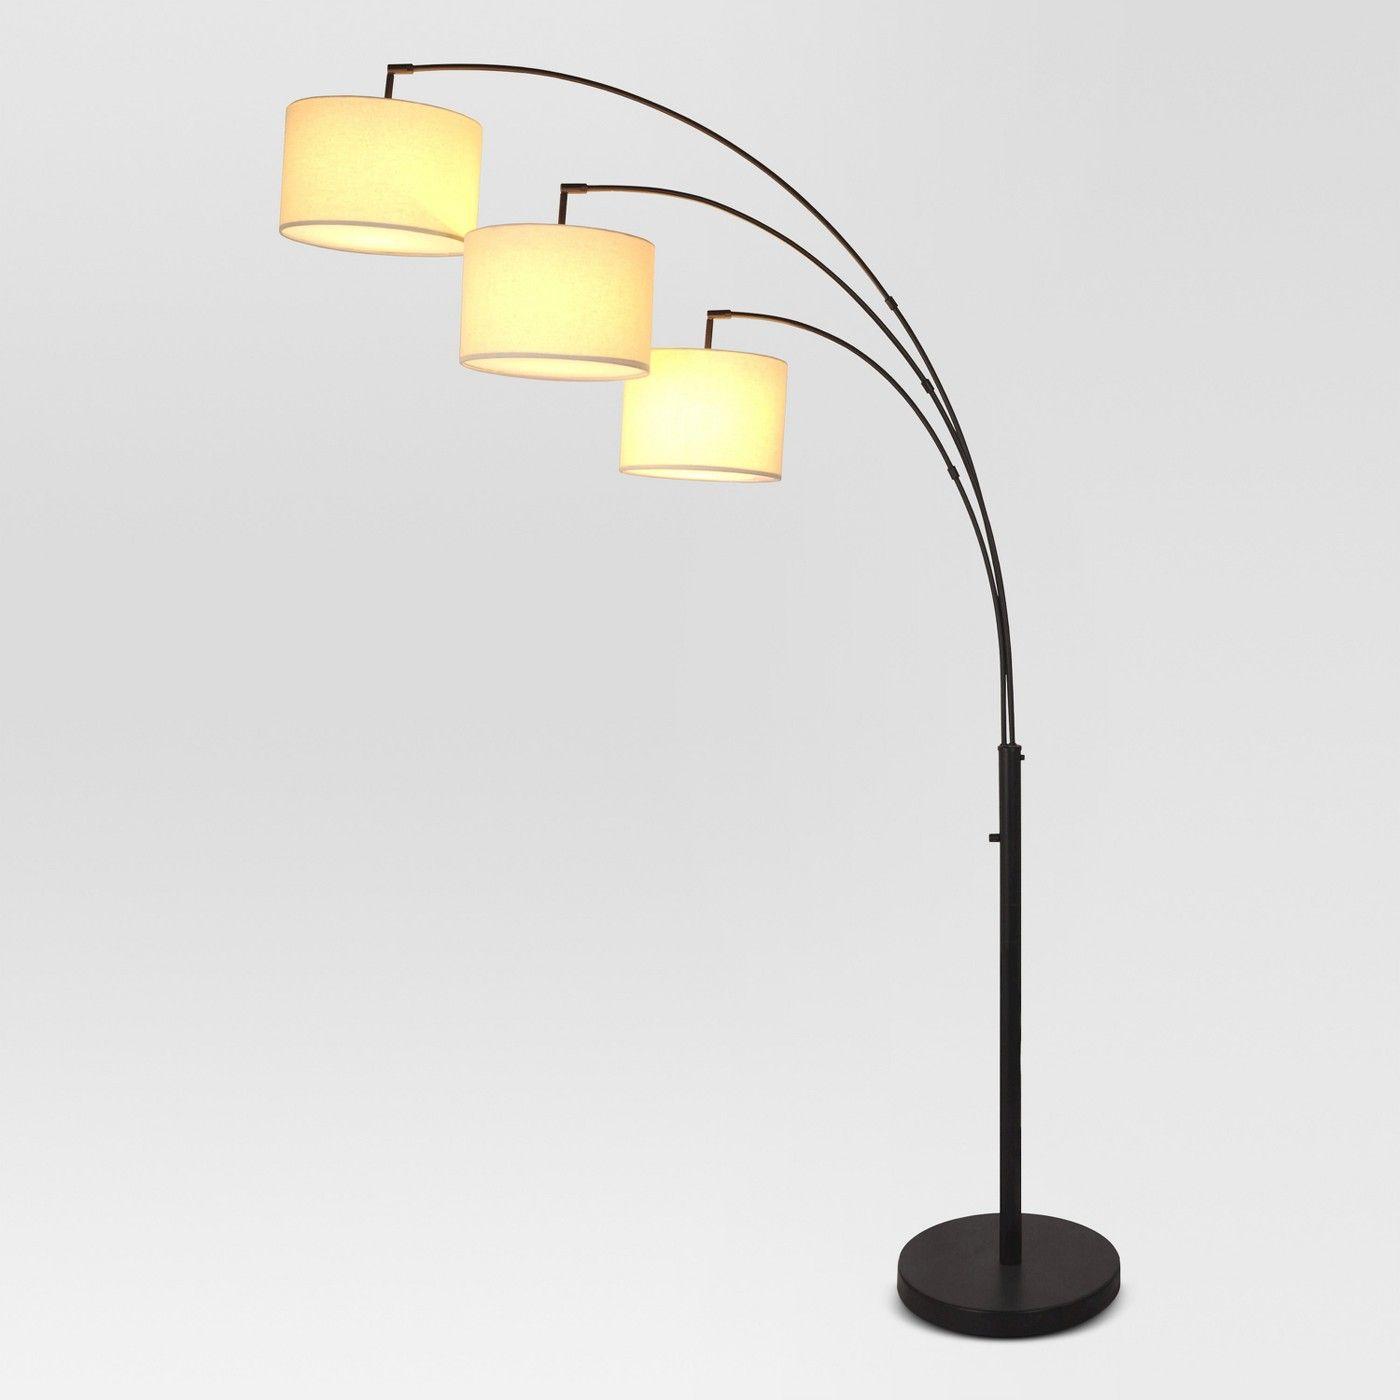 Avenal Shaded Arc Floor Lamp - Project 17™  Arc floor lamps